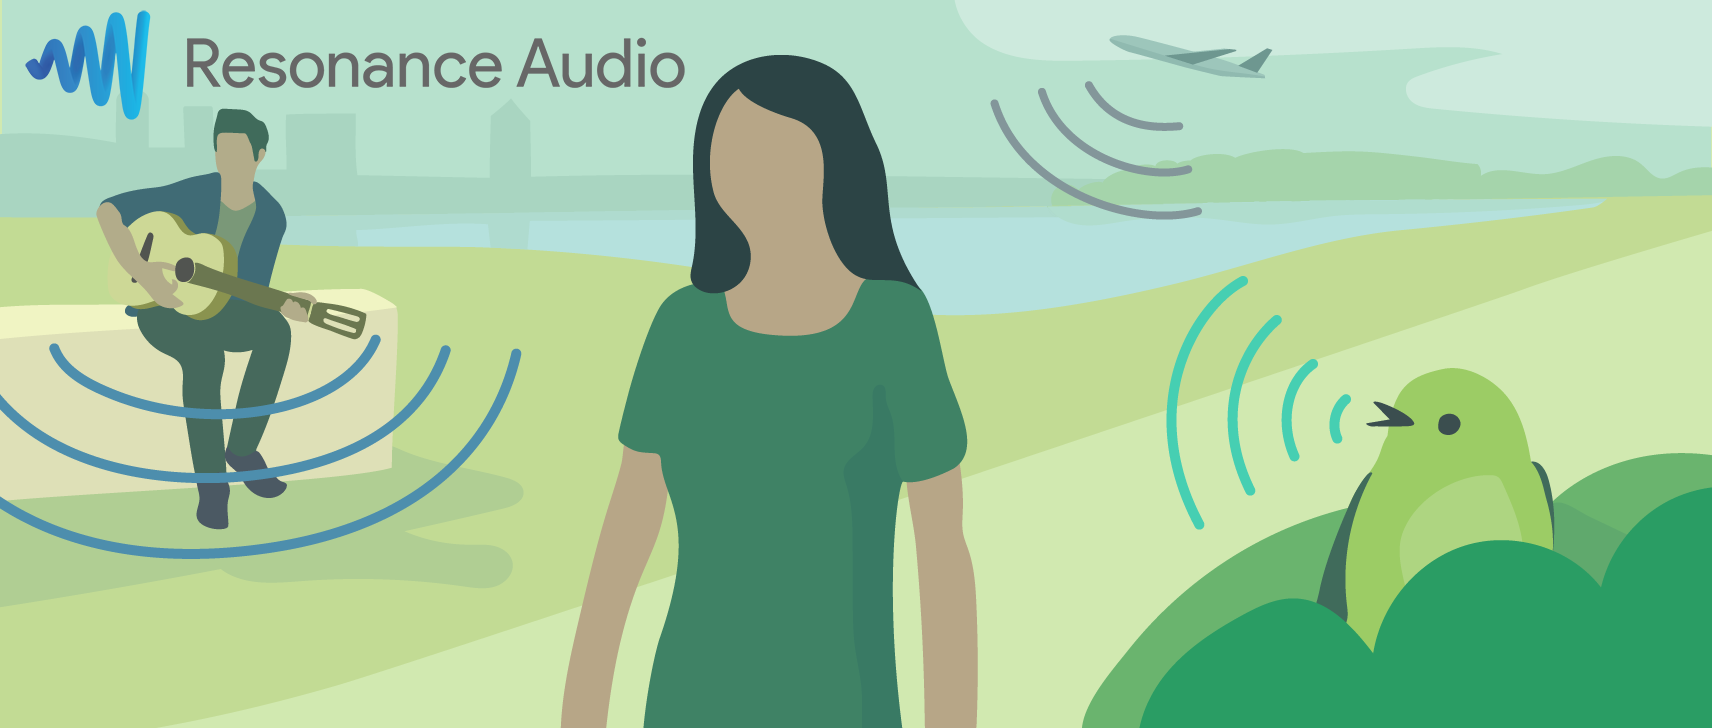 Open sourcing Resonance Audio